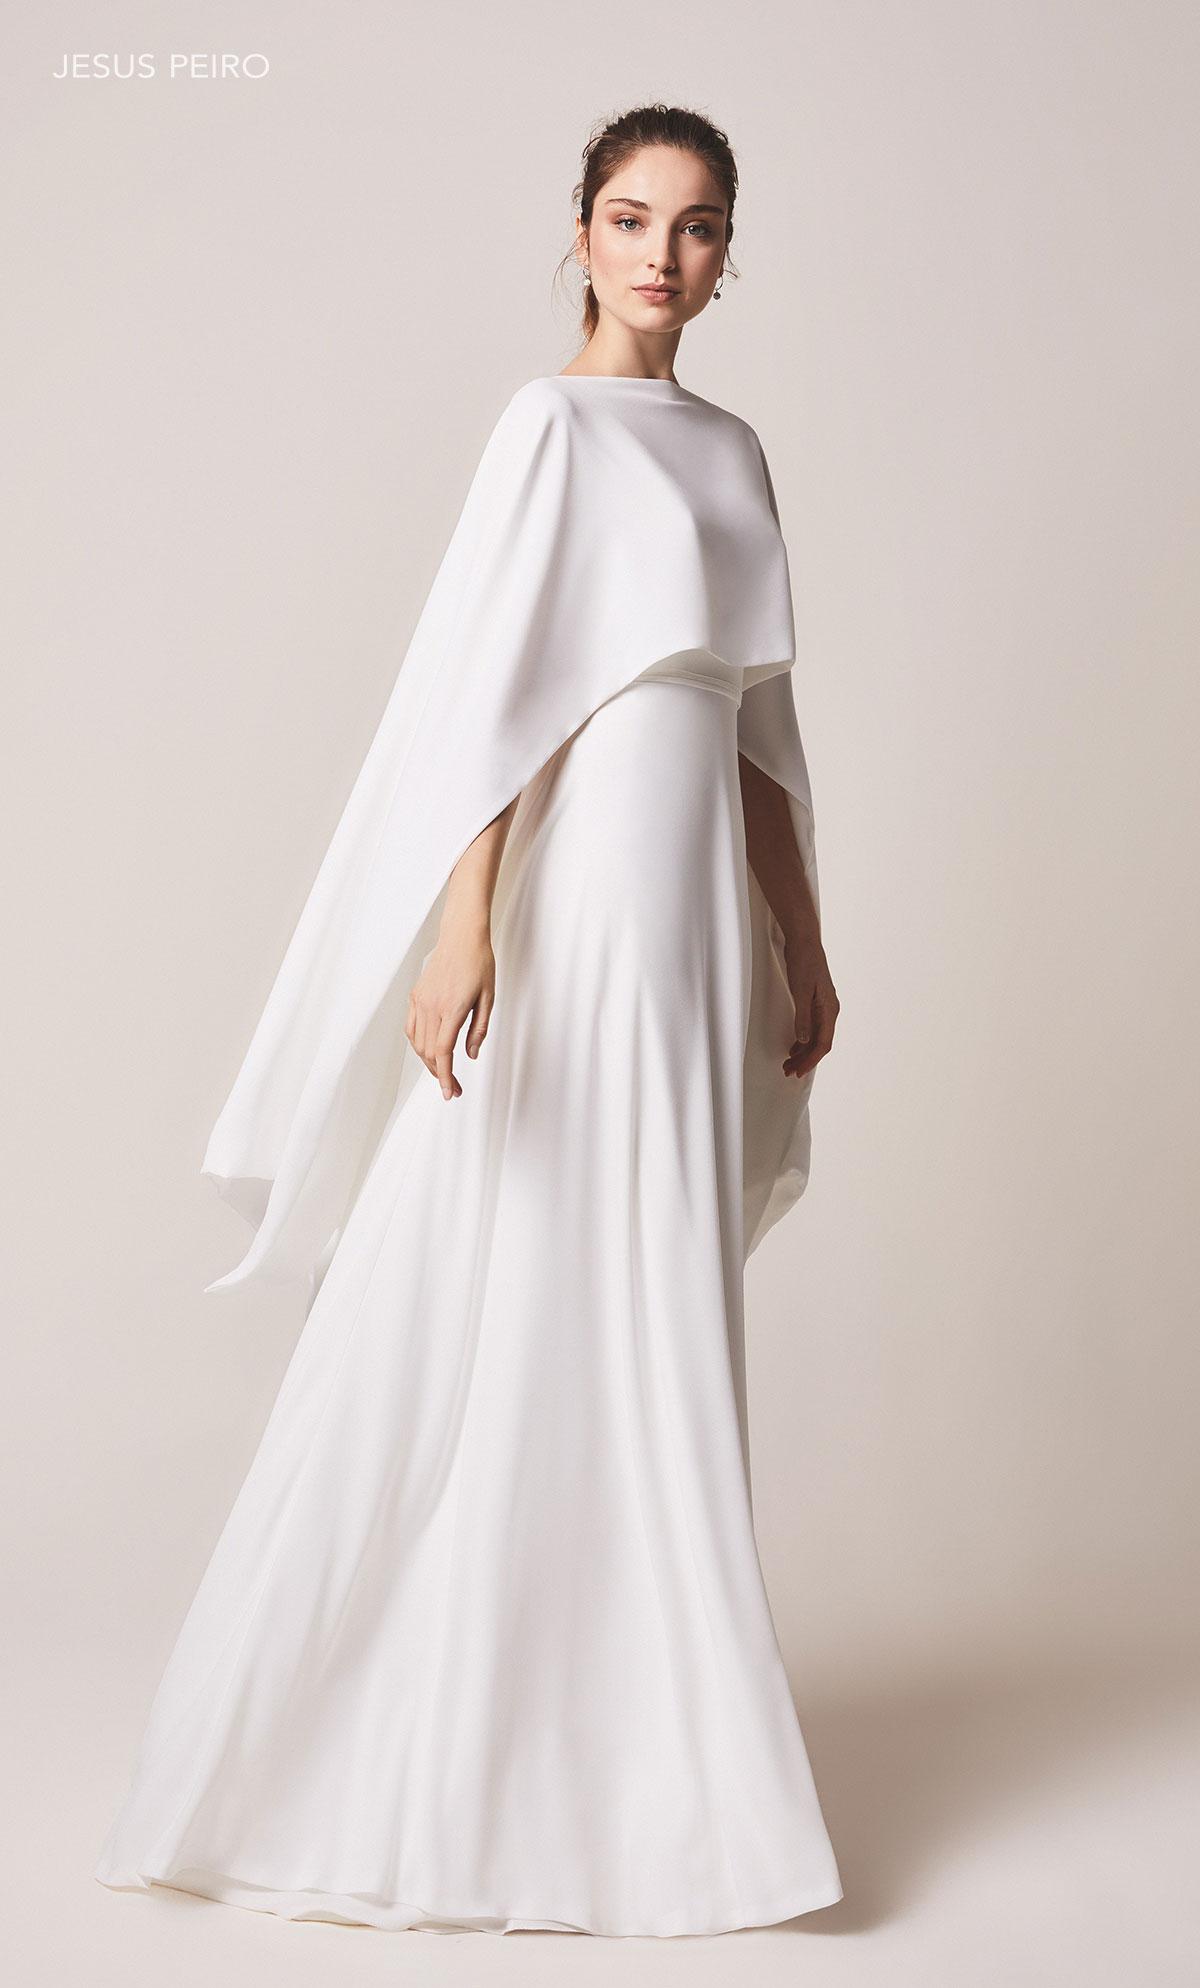 Vestido novia Jesús Peiró Ref.130